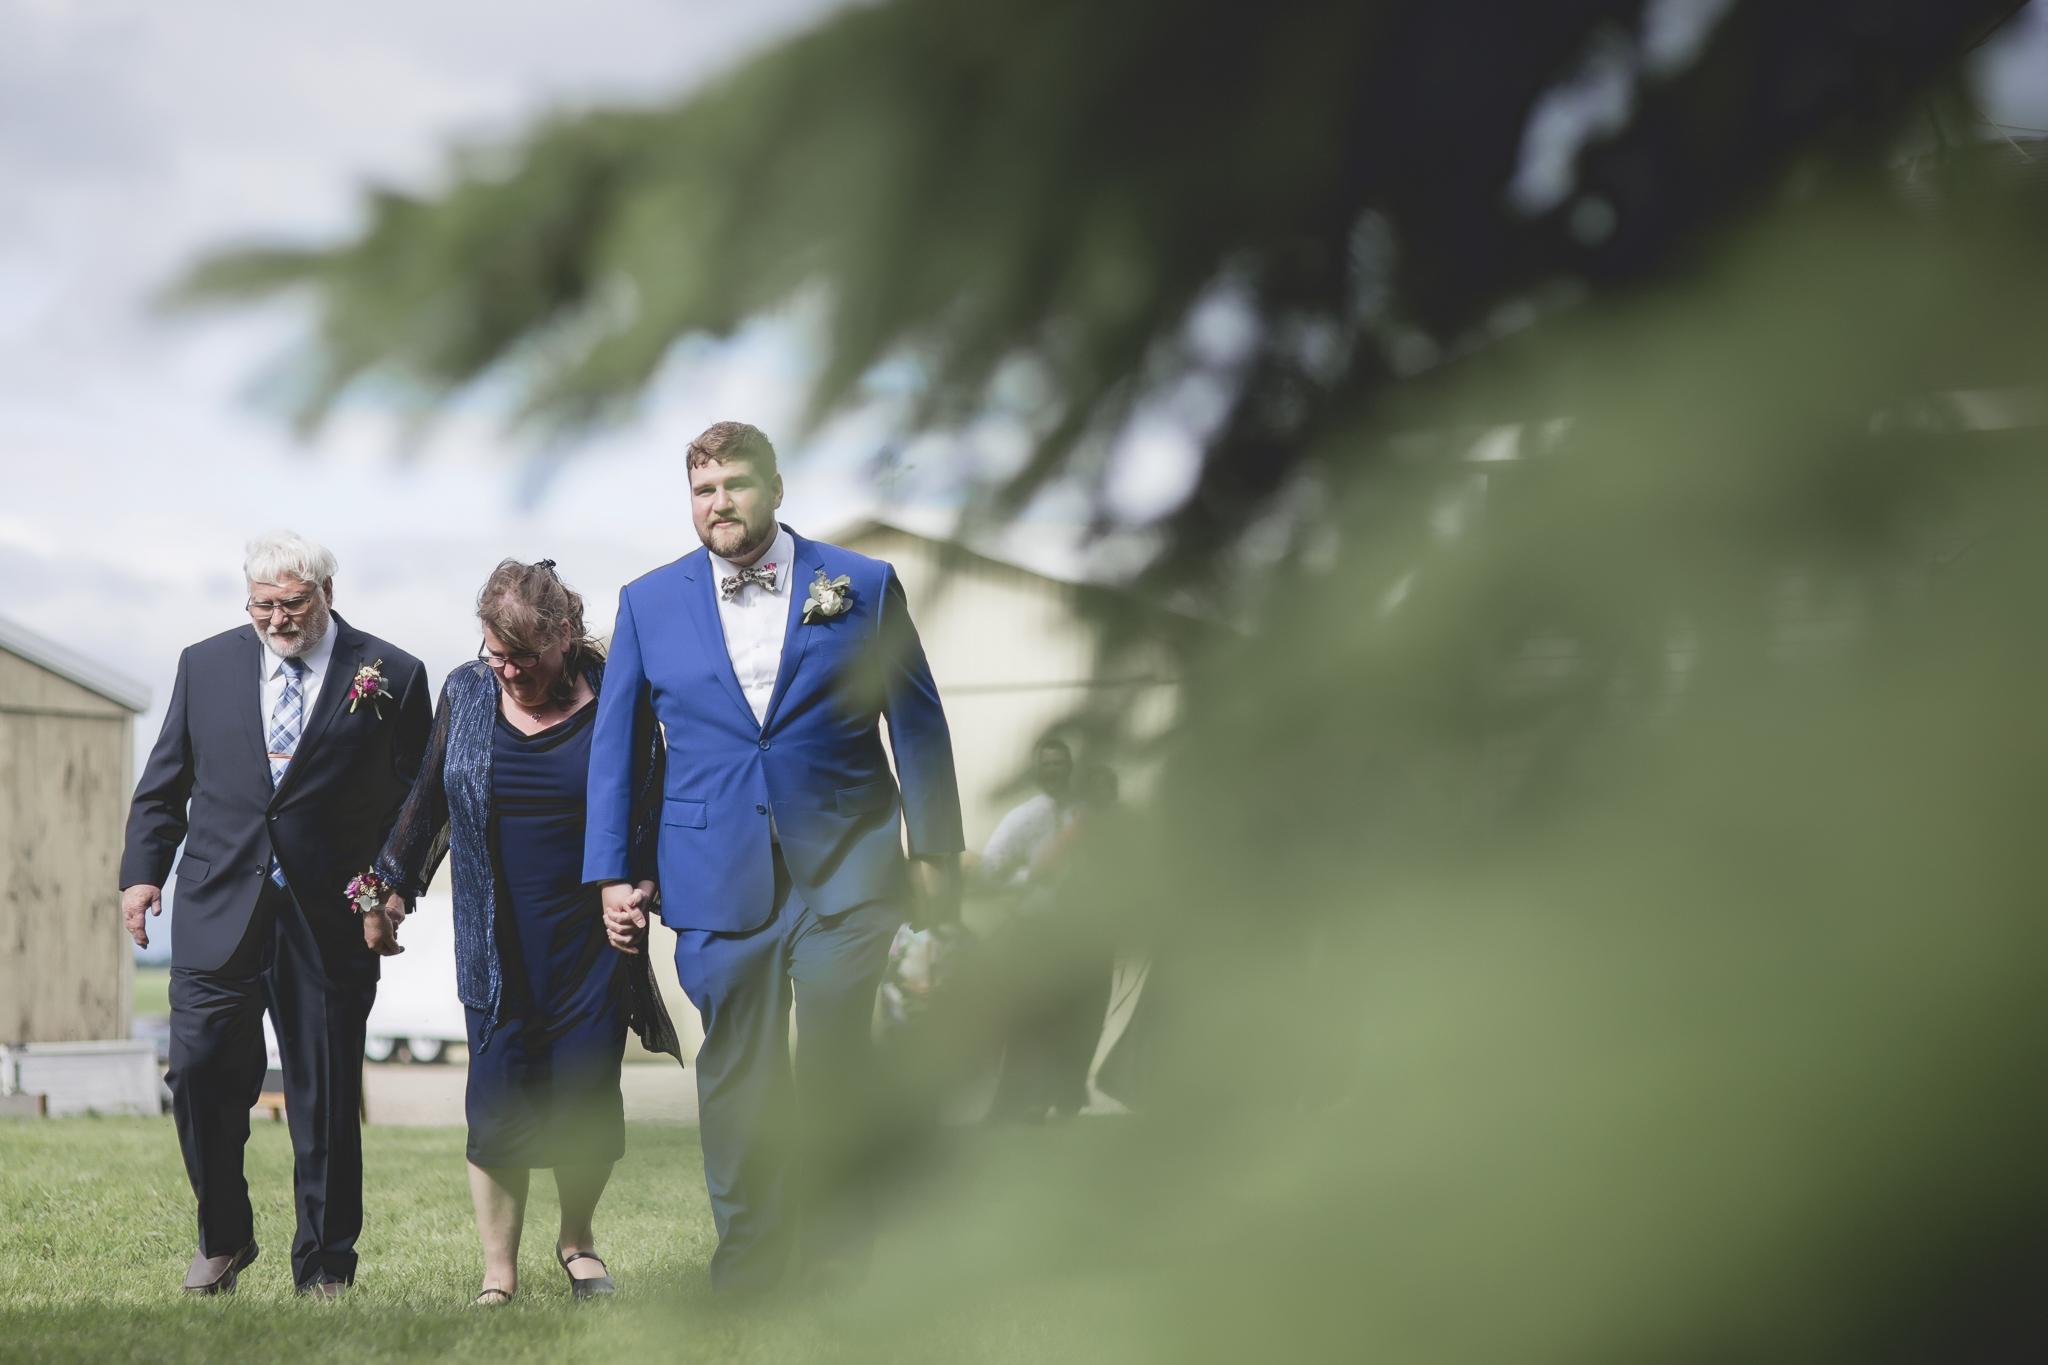 minnesota family farm outdoor wedding photographer-22.jpg